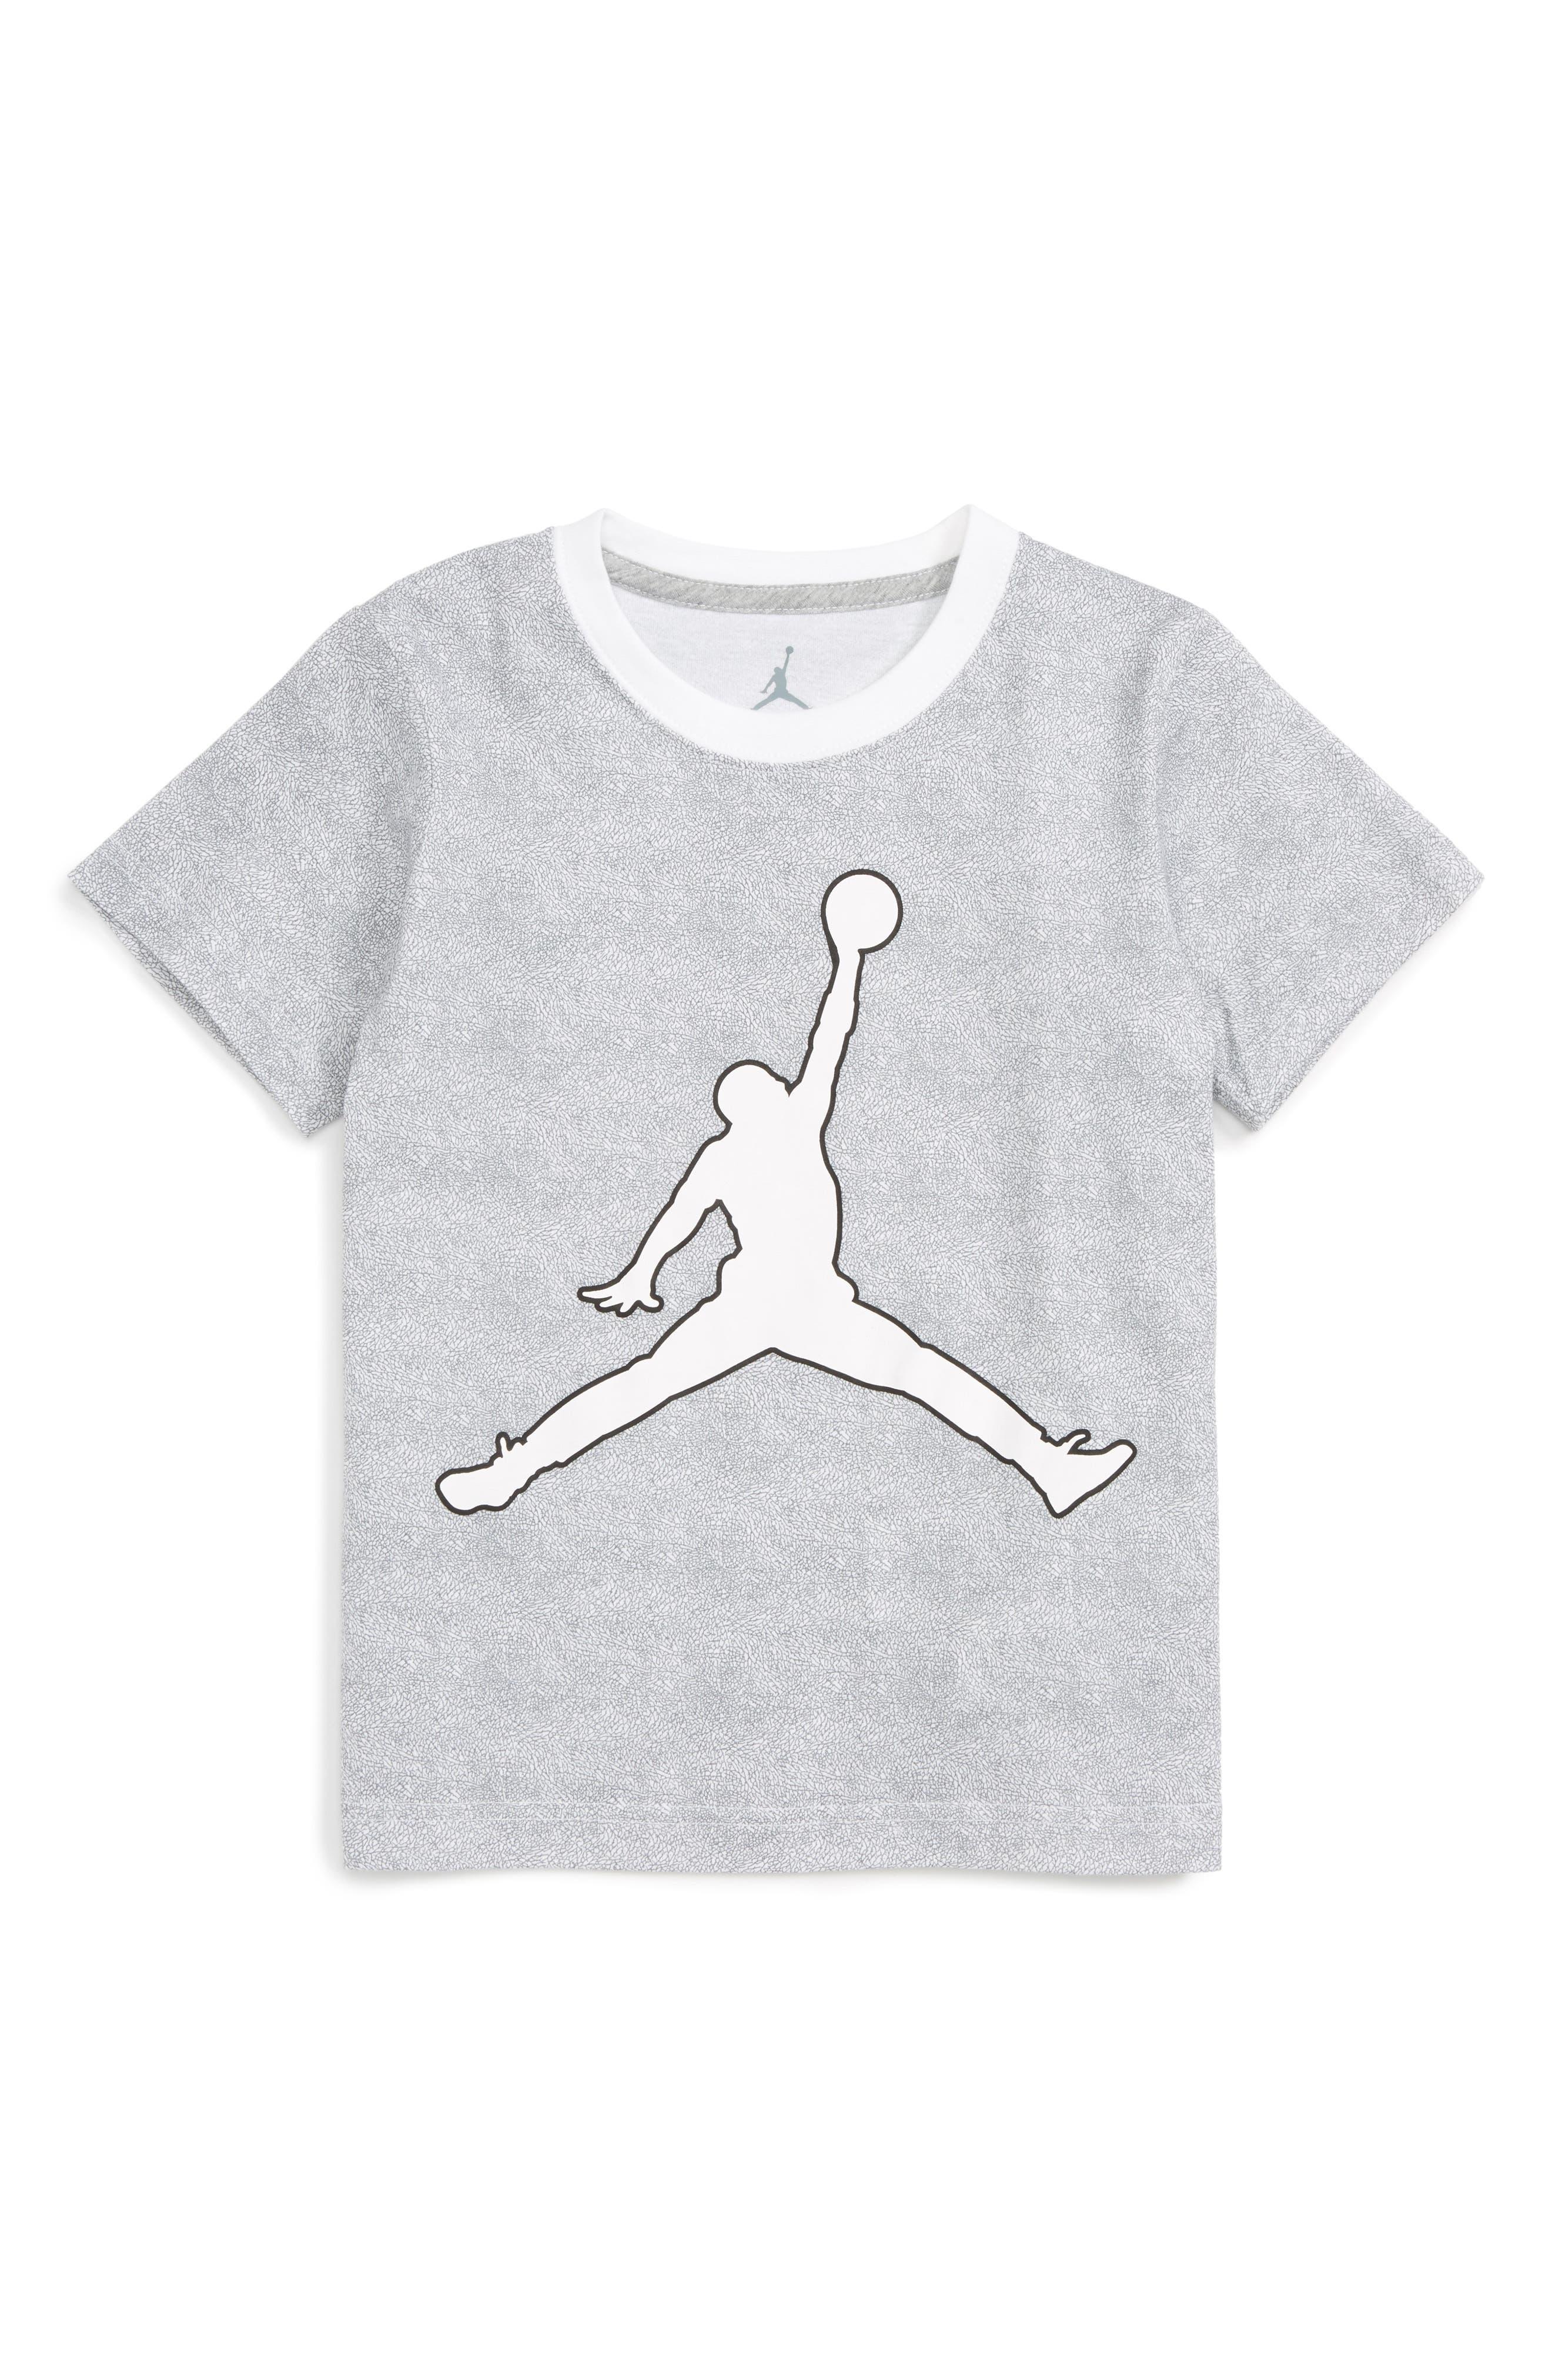 Alternate Image 1 Selected - Jordan Jumpman Graphic T-Shirt (Toddler Boys & Little Boys)